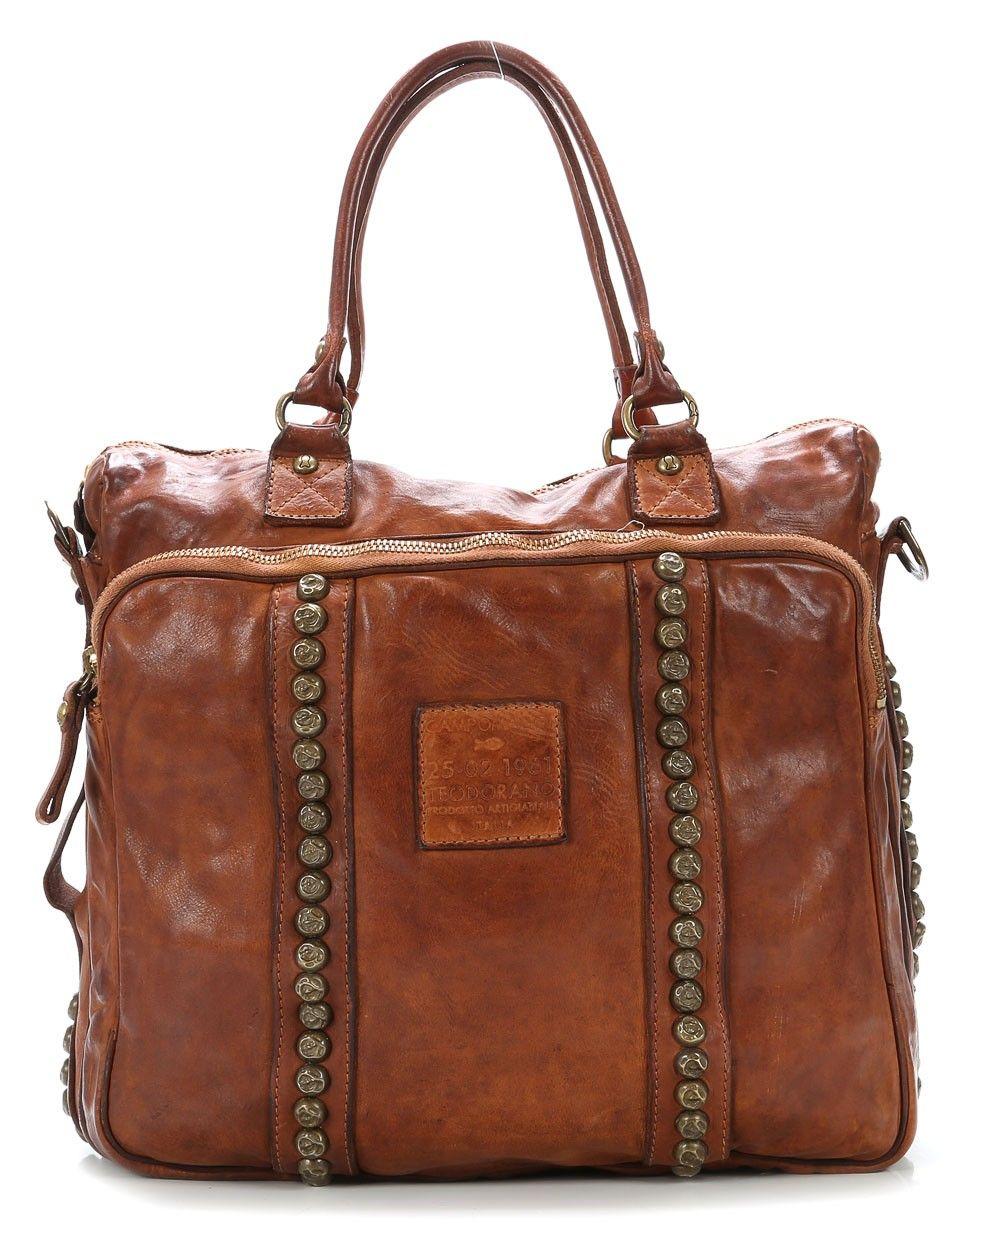 Bags Handbags И Campomaggi Bag Shoe Sx1xw4